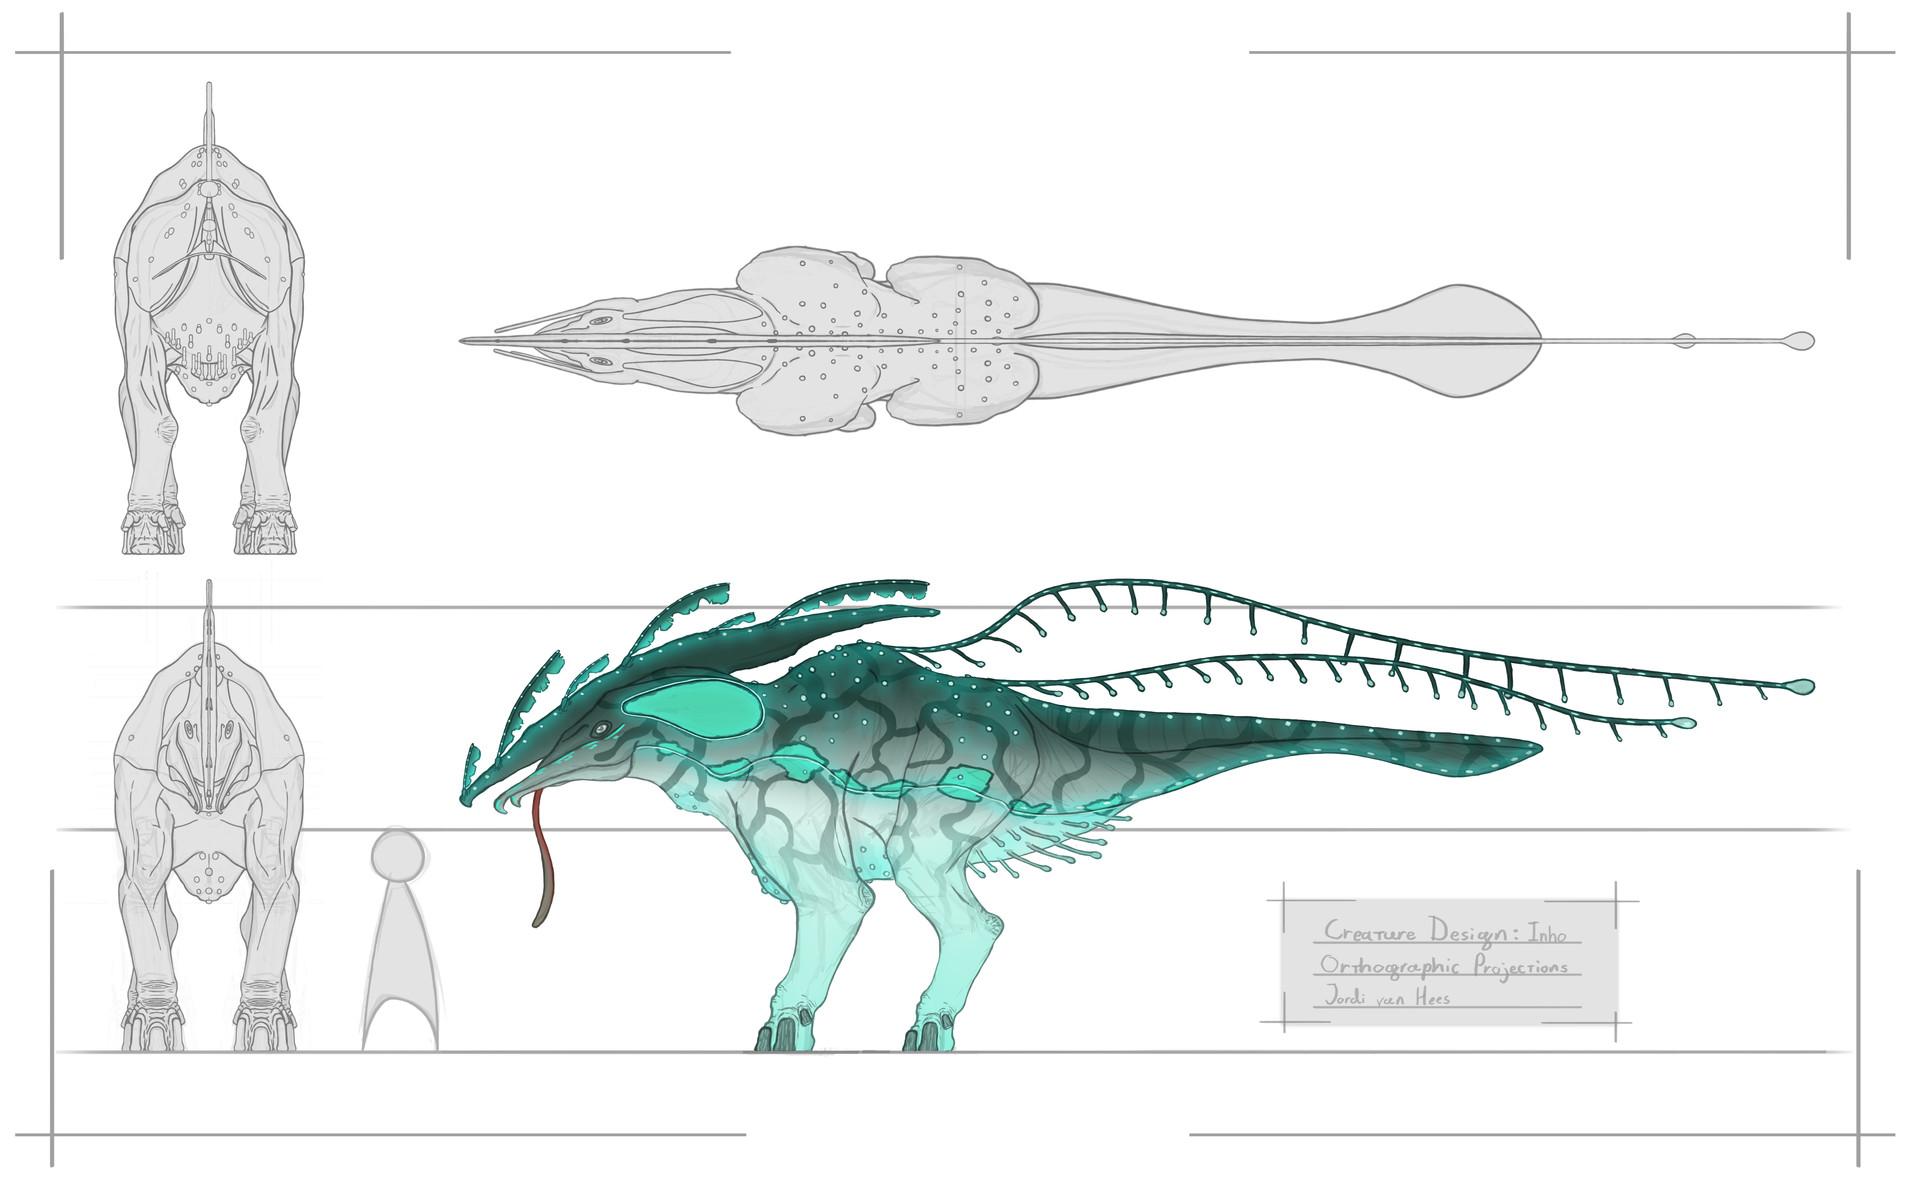 Jordi van hees concept art monster color ortho projection presentable done